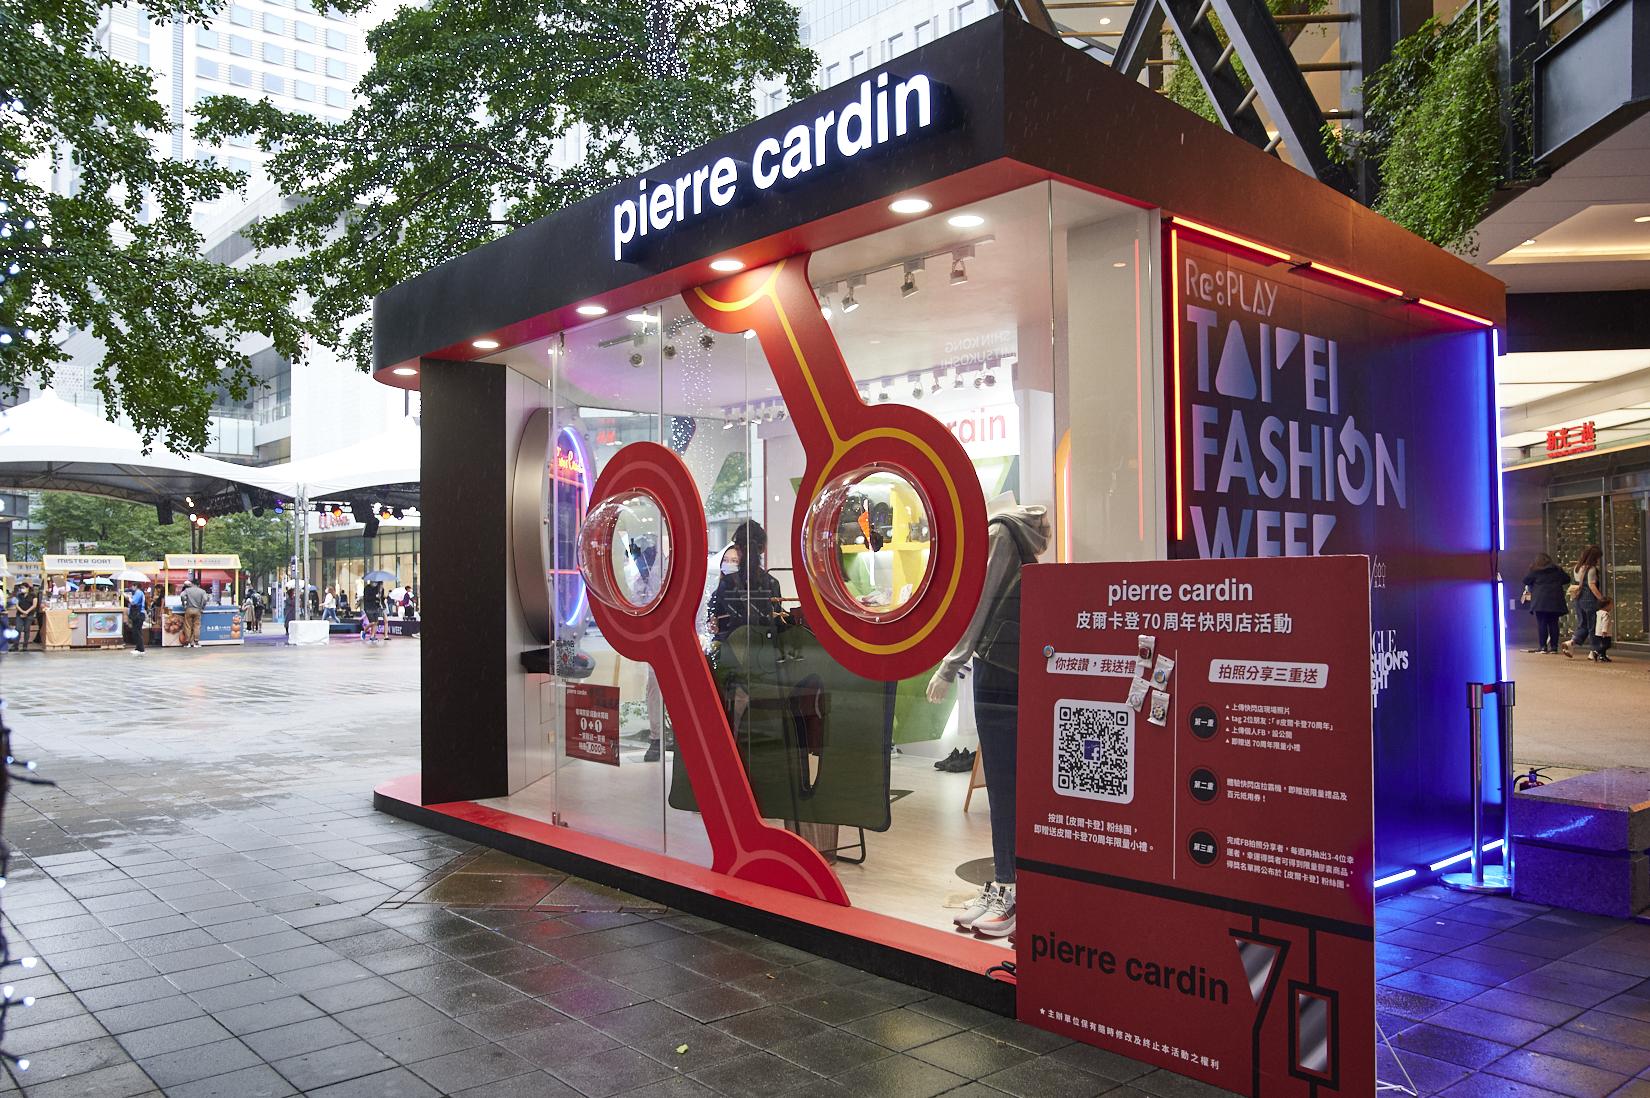 Pierre Cardin 1 - giles.heasman(何家樂) - Taiwan - Taipei Fashion Week x Vogue FNO - Sponsor 2